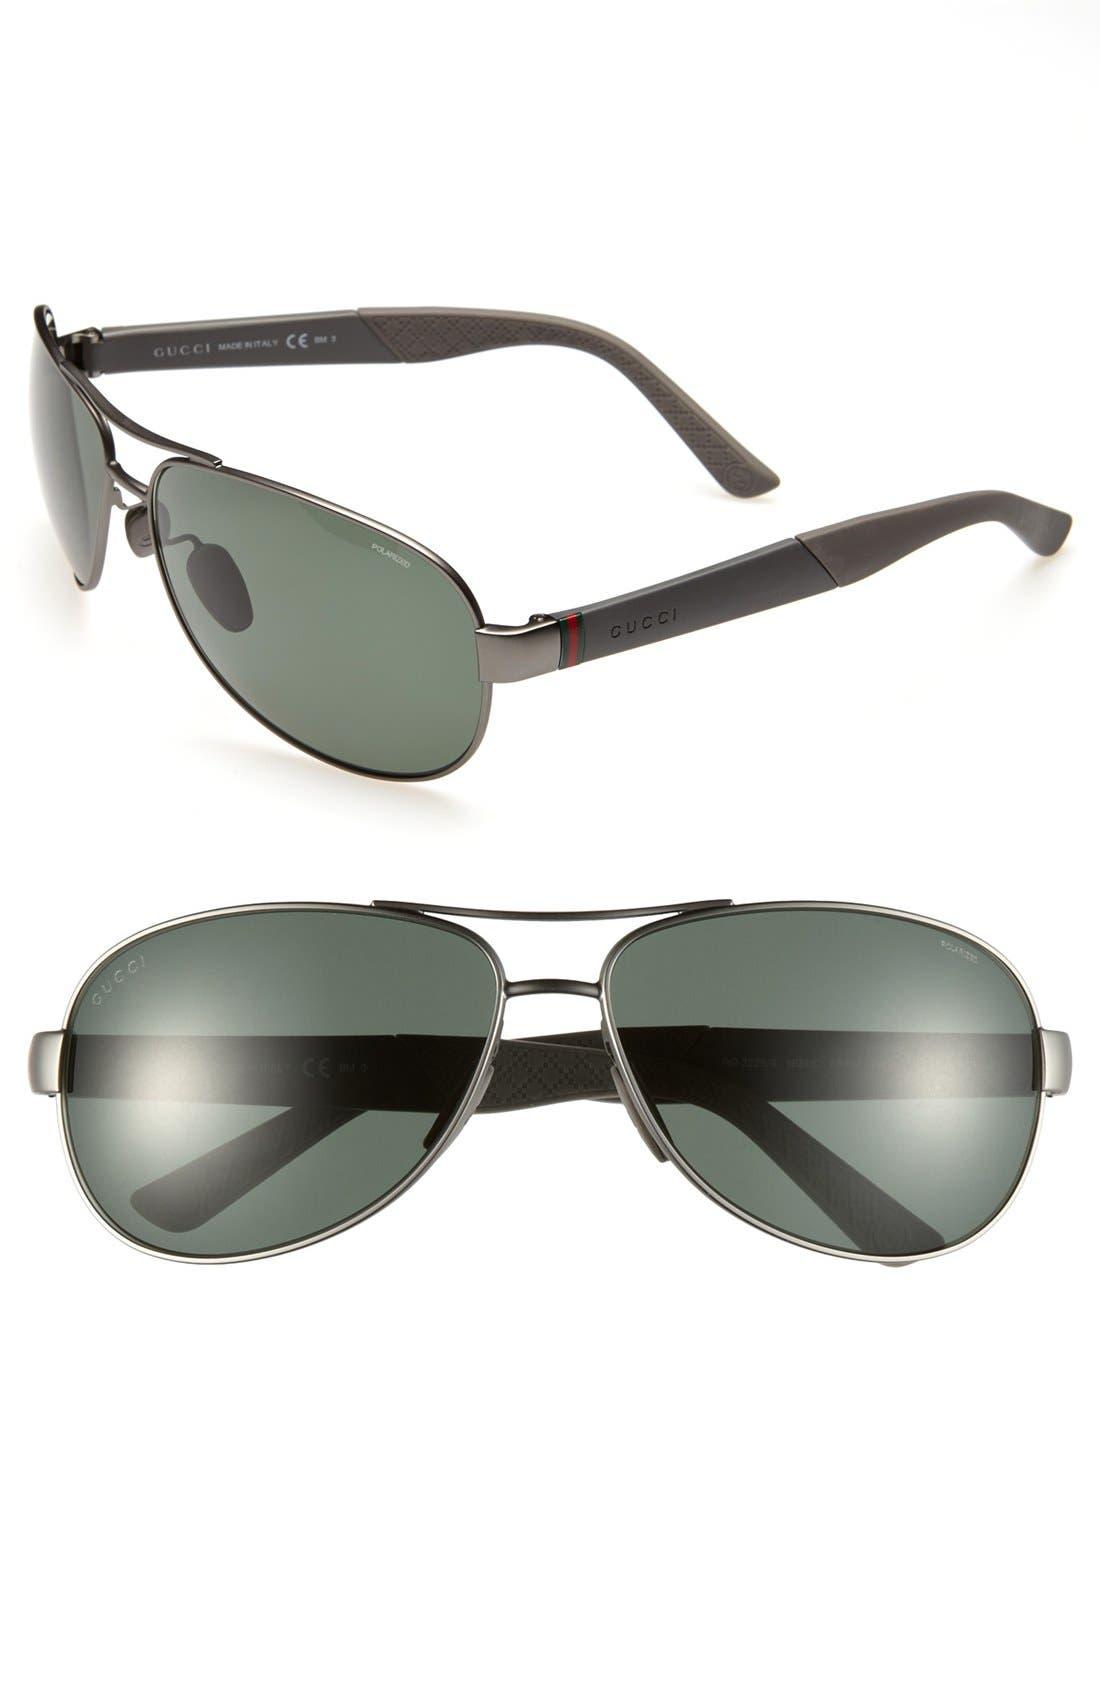 Alternate Image 1 Selected - Gucci Polarized 63mm Sunglasses